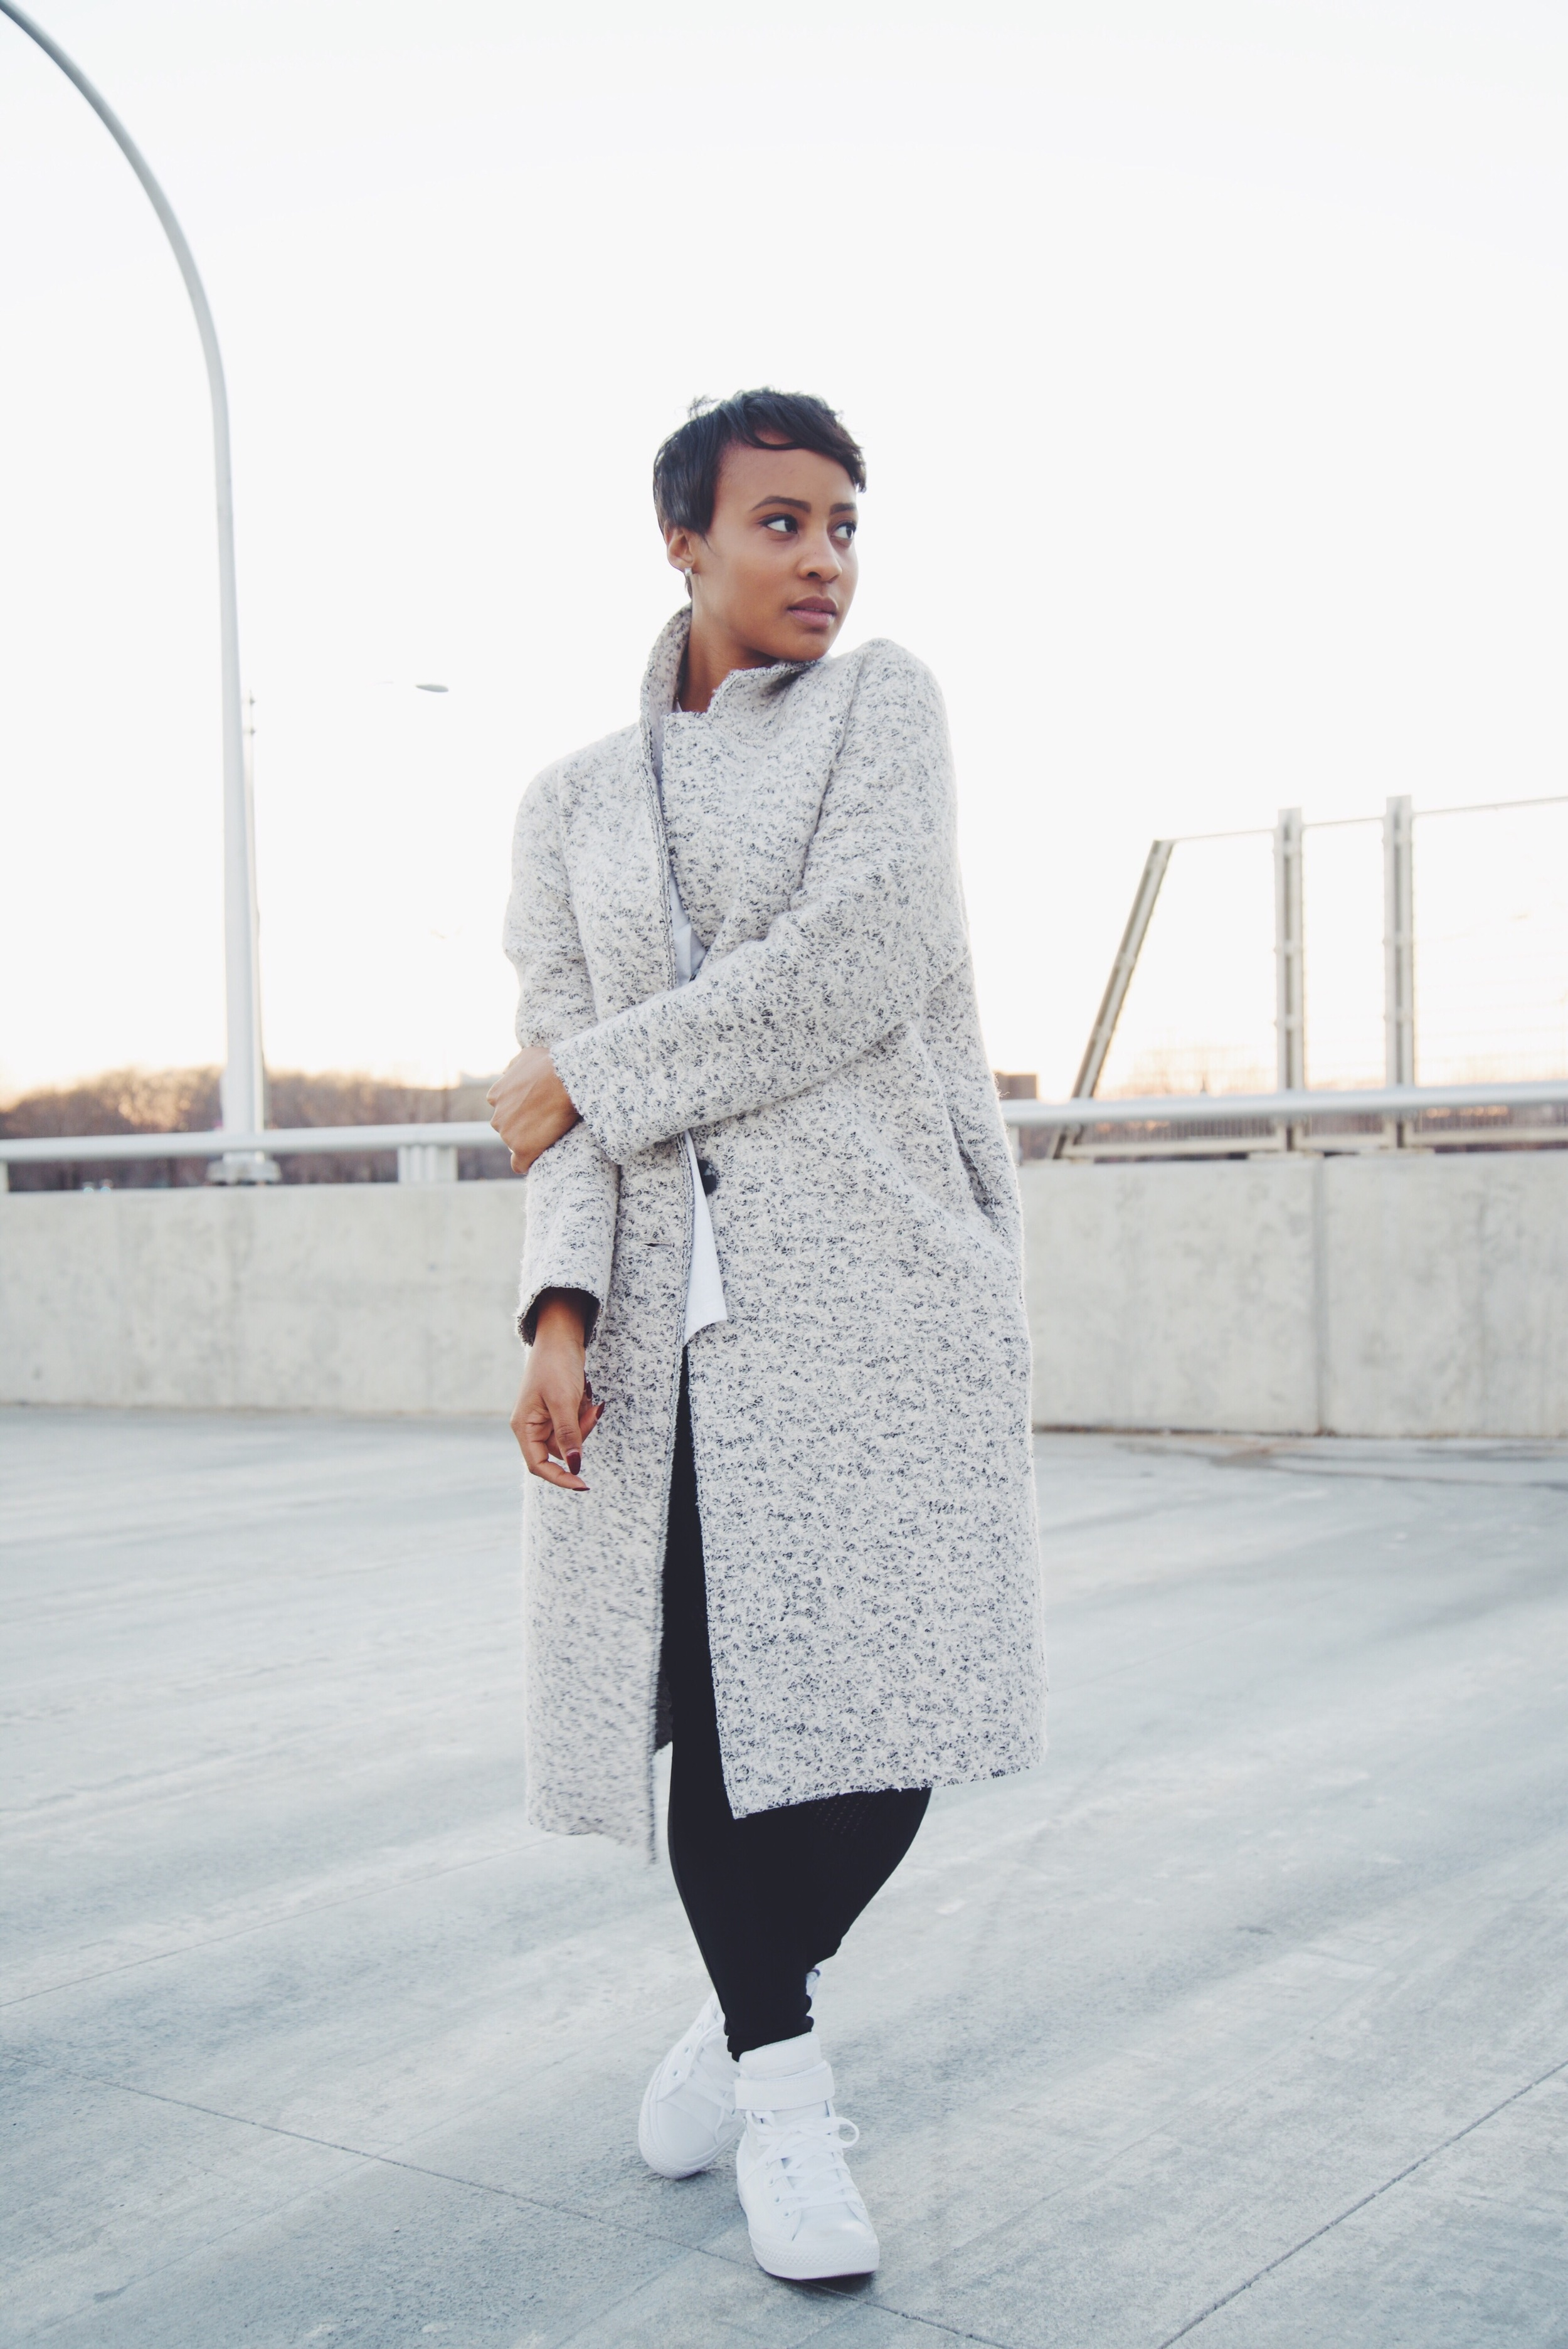 Jacket: Zara / Legging: Urban Outfitters / Shirt: Zara